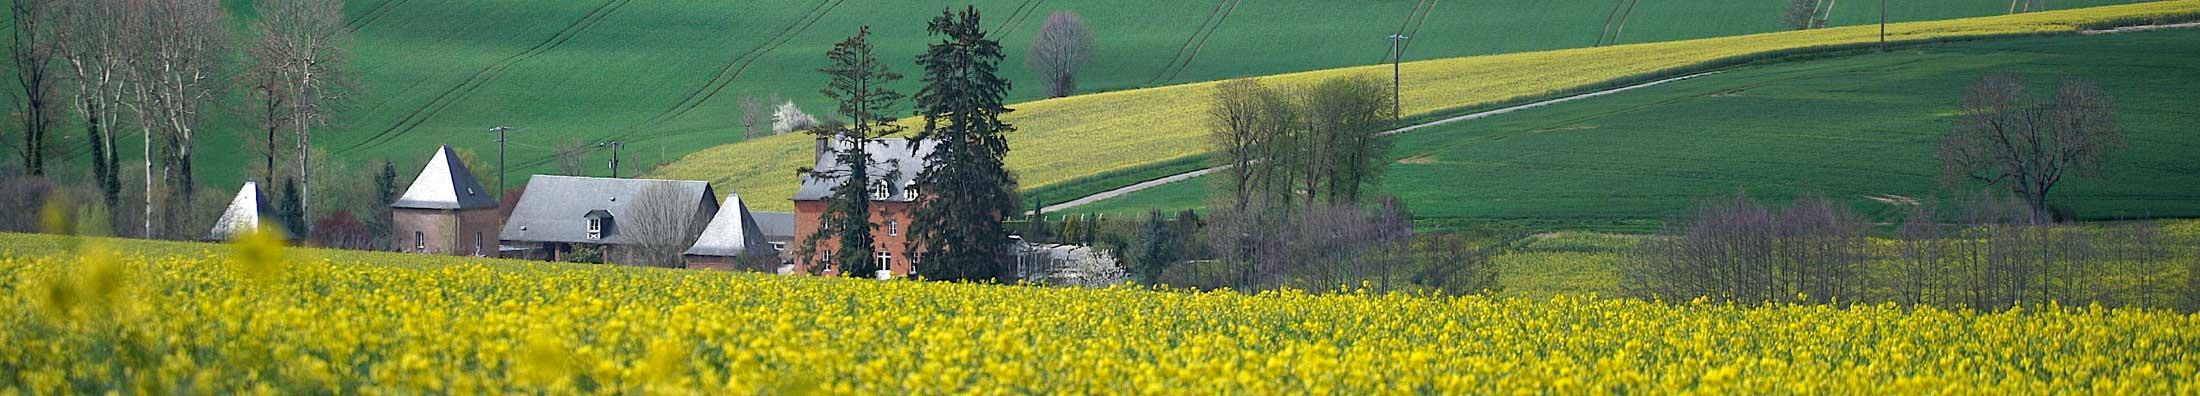 Beste Bed and Breakfast - B&B Au Chapitre - Rozoy-sur-Serre - topfoto